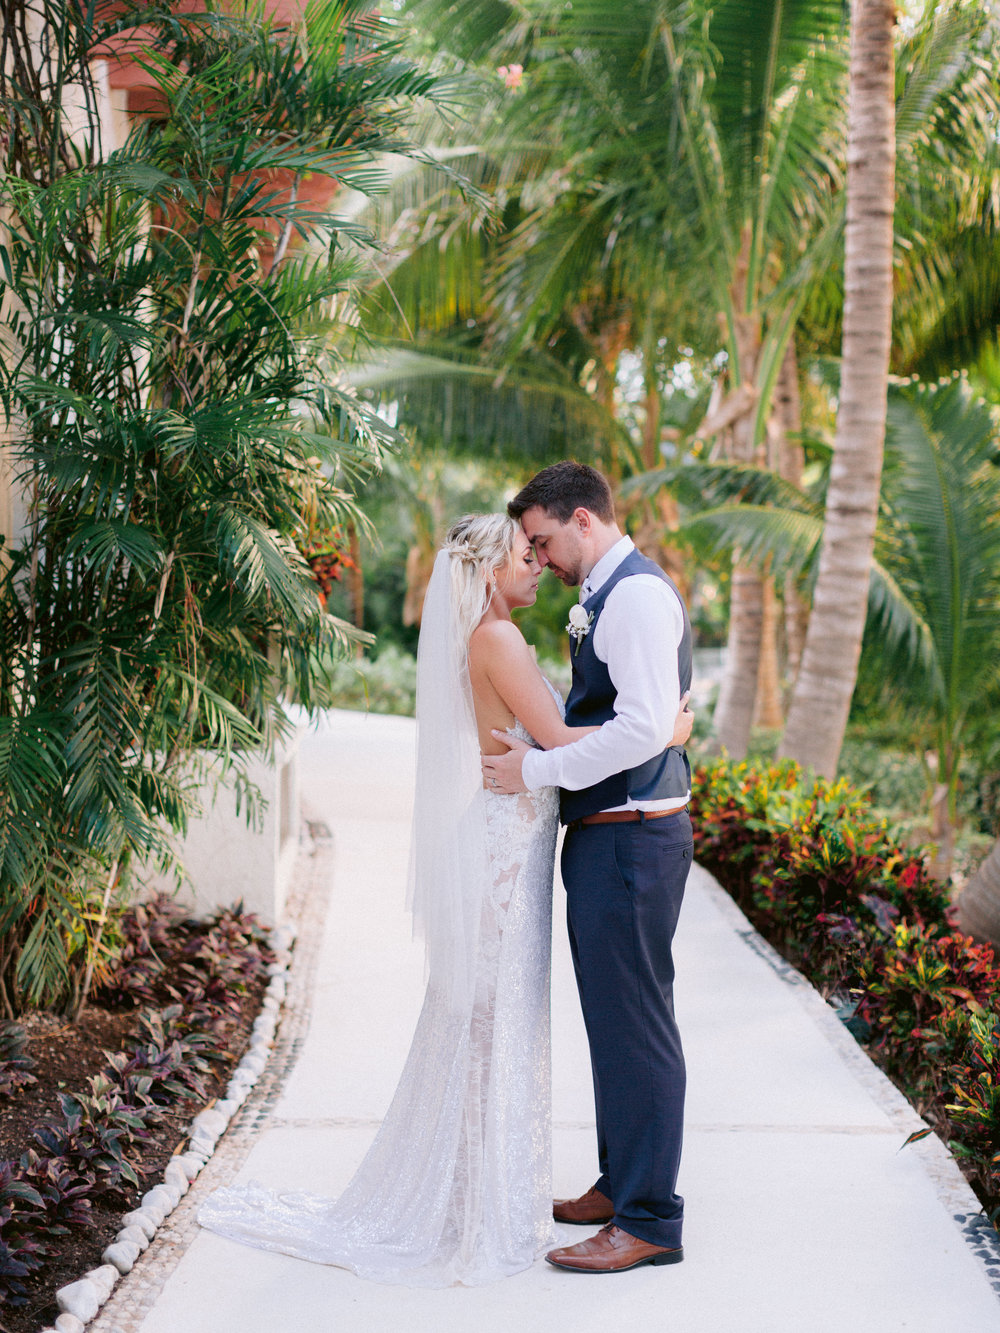 Kim_Jeff_Cancun Wedding_Portraits_Kurtz_Orpia (74 of 178).jpg